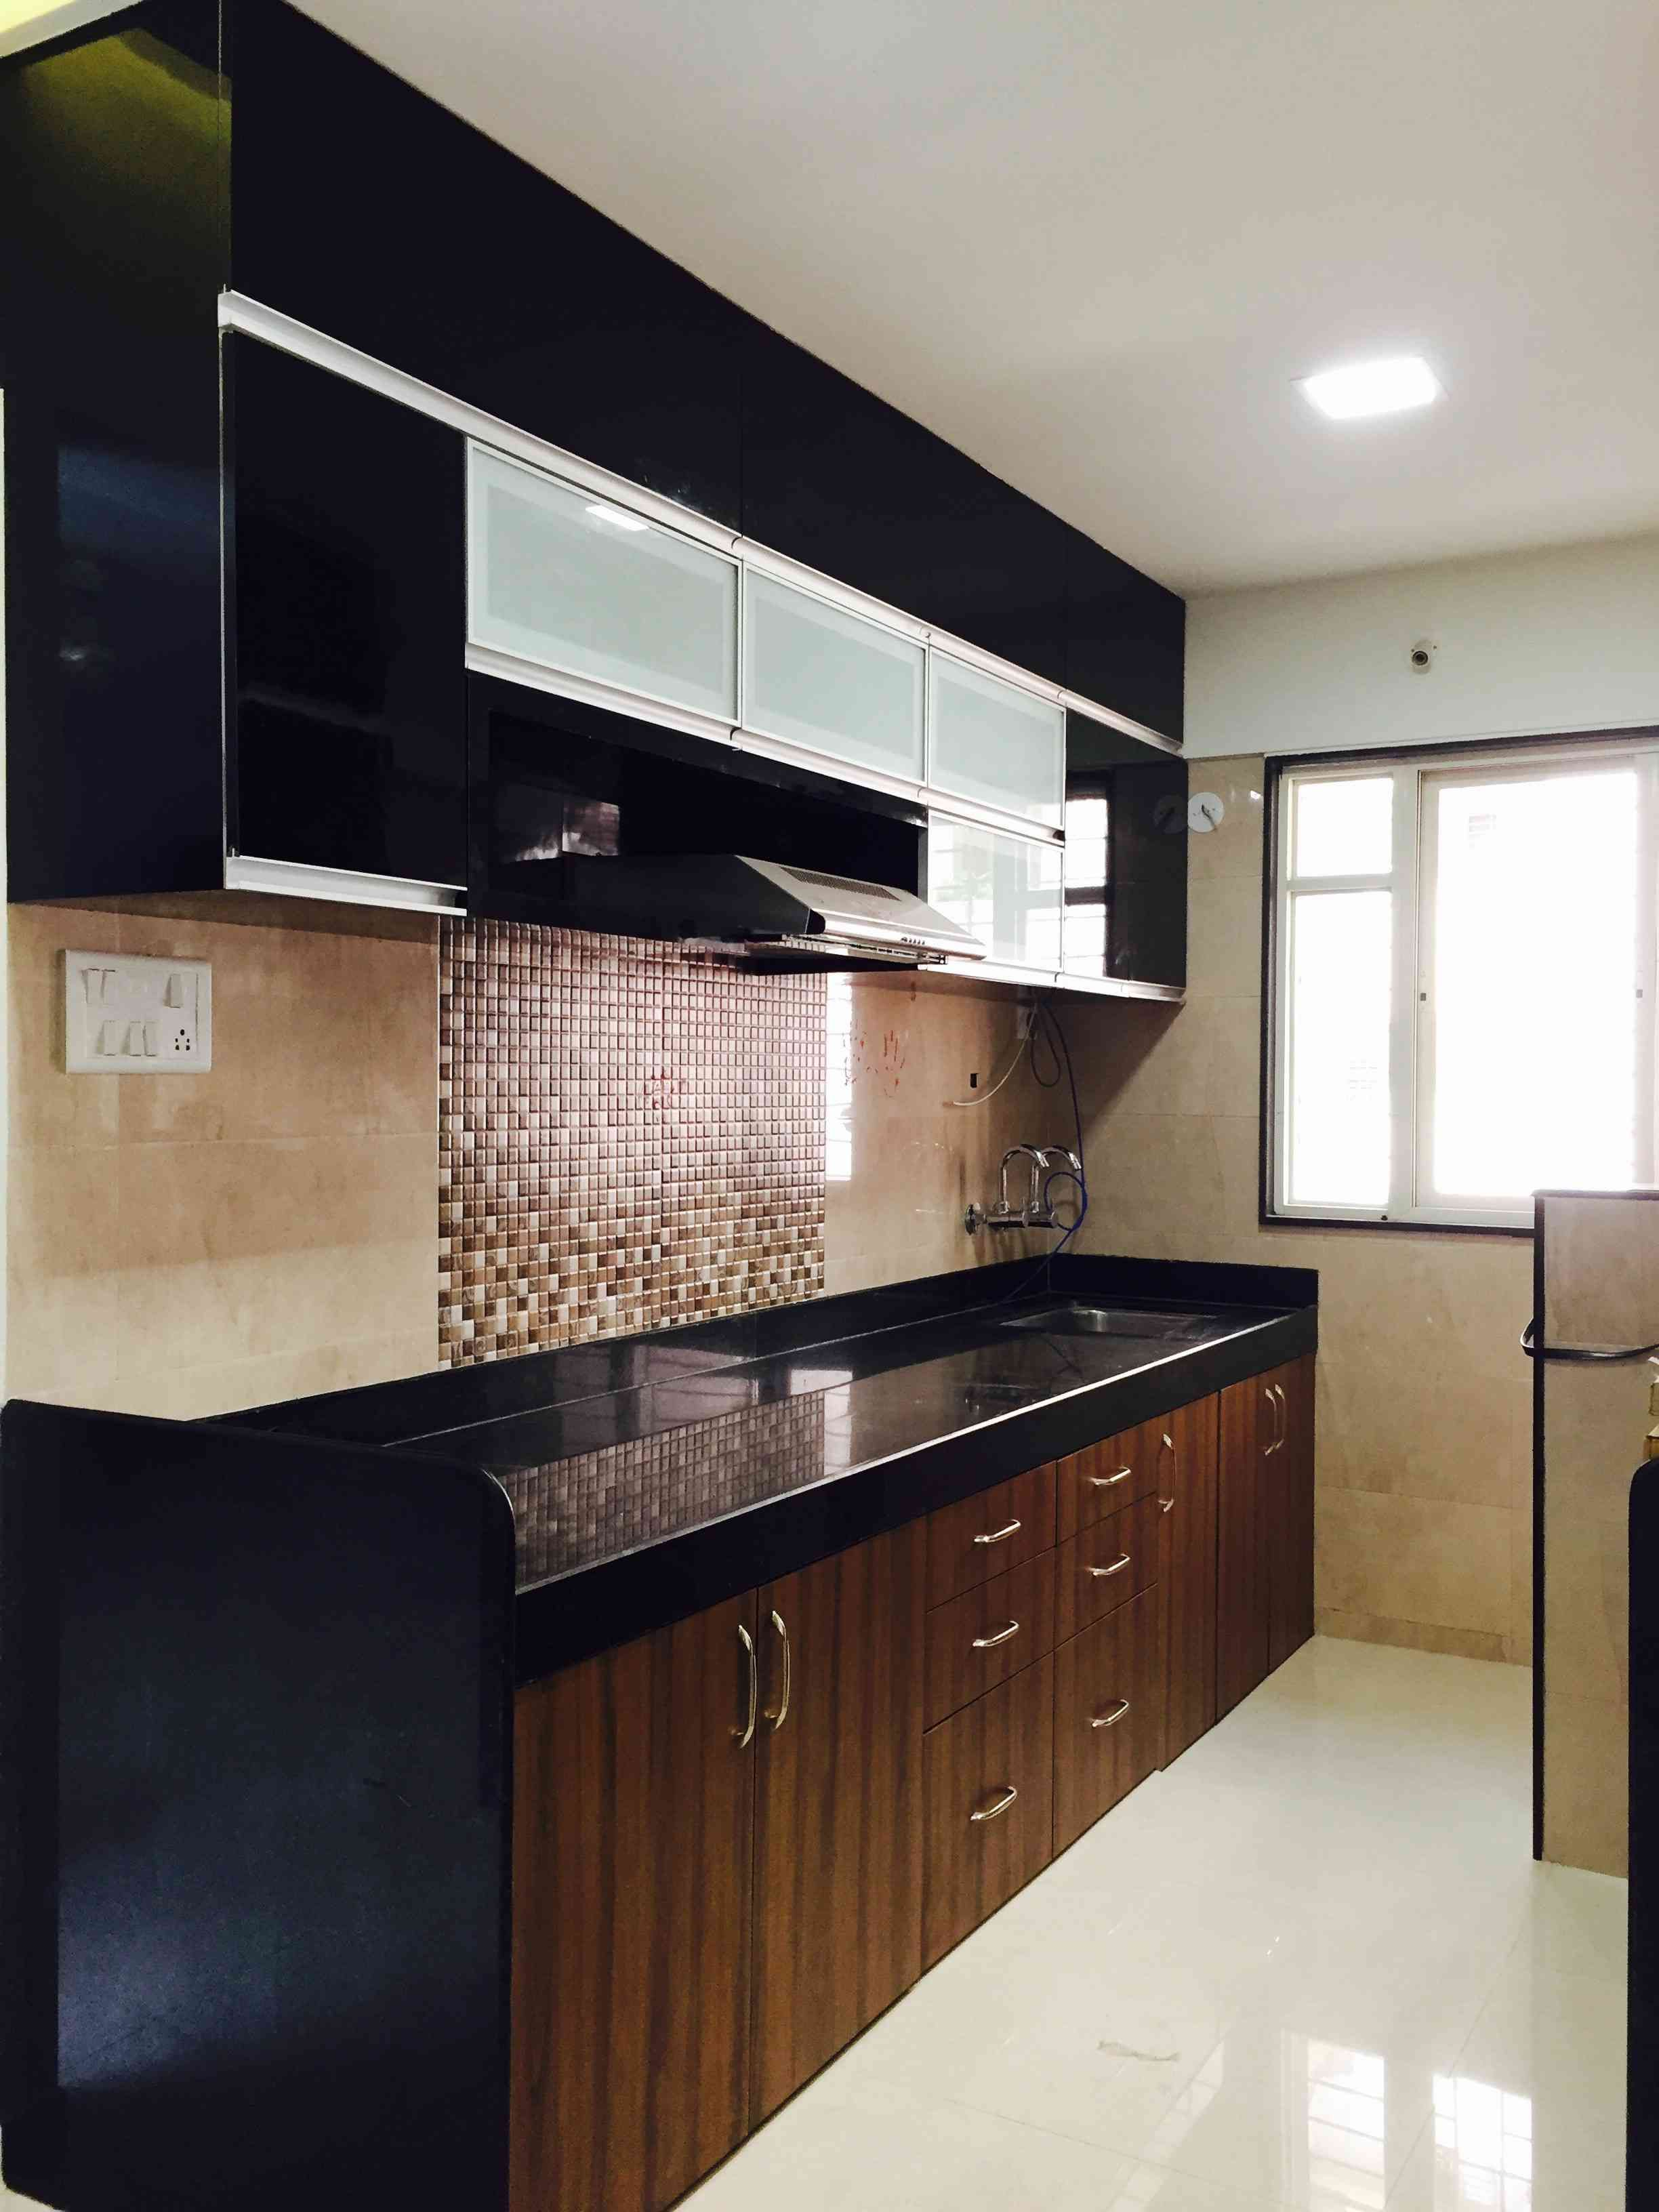 Pin By Zingyhomes Com On Kitchen Ideas Kitchen Interior Single Bedroom Kitchen Design